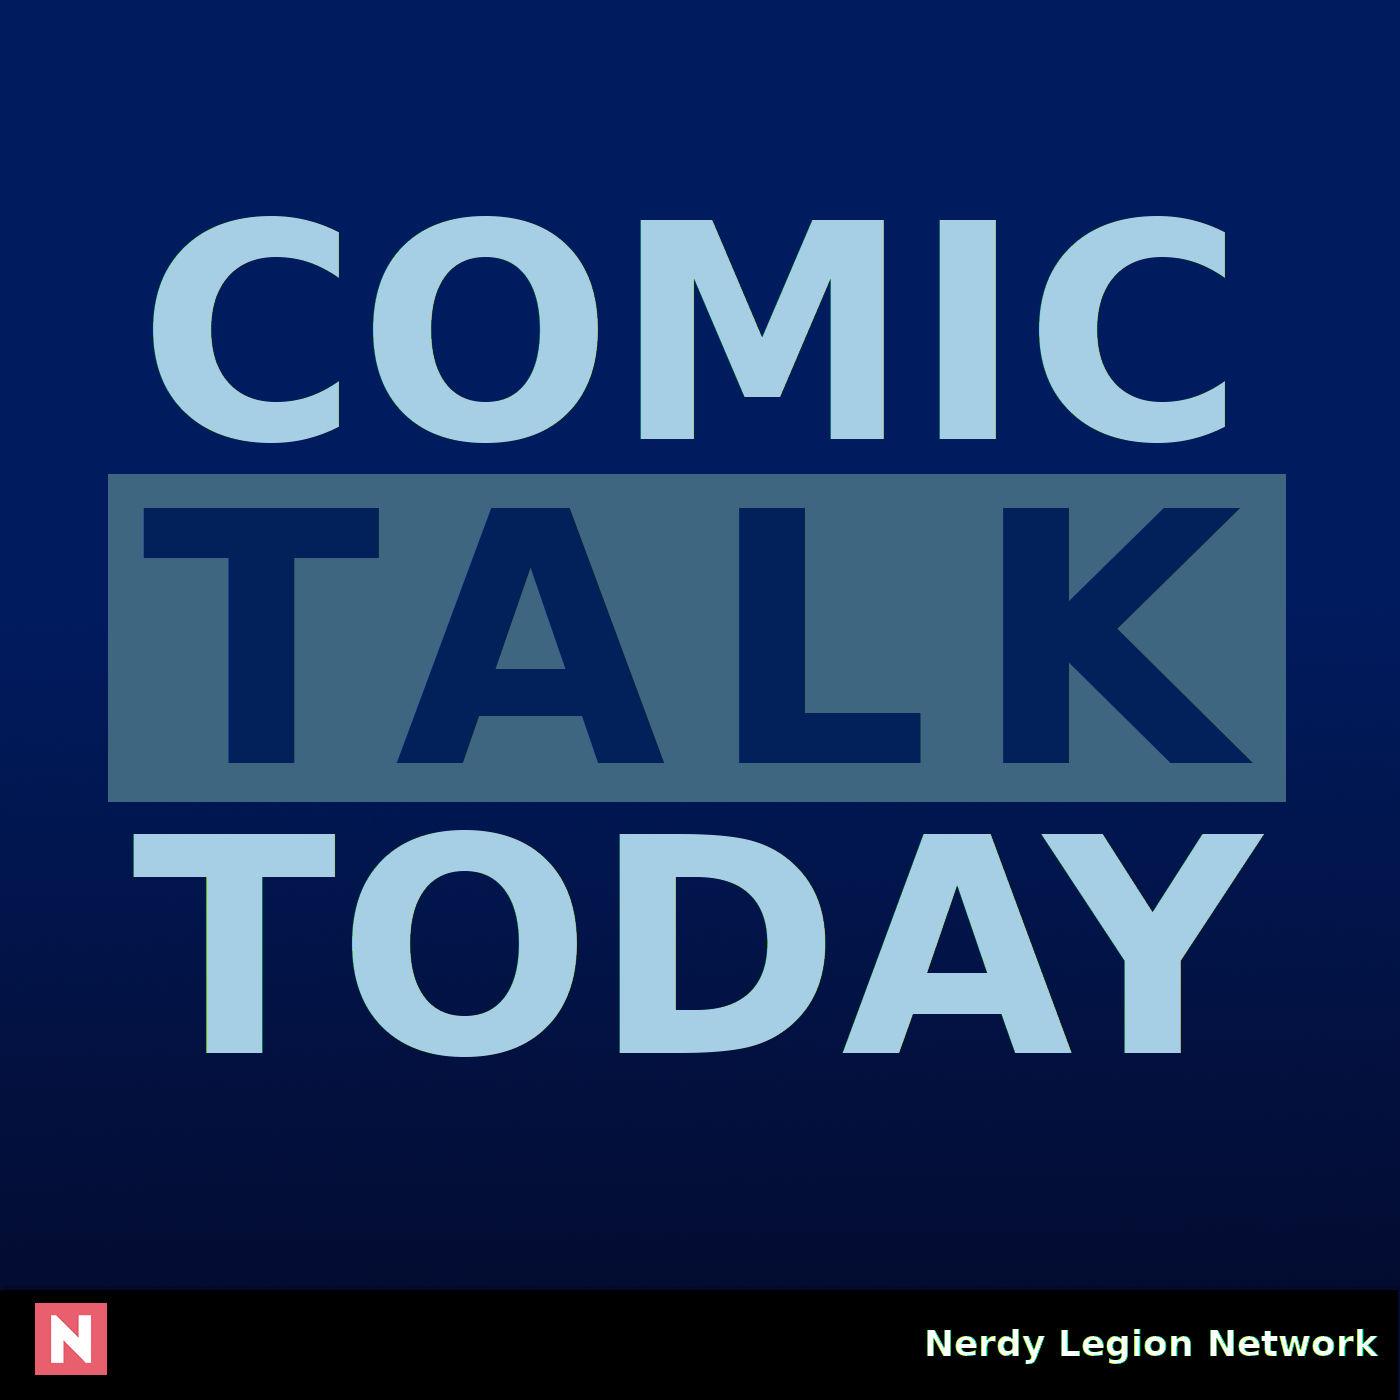 Comic Talk Today